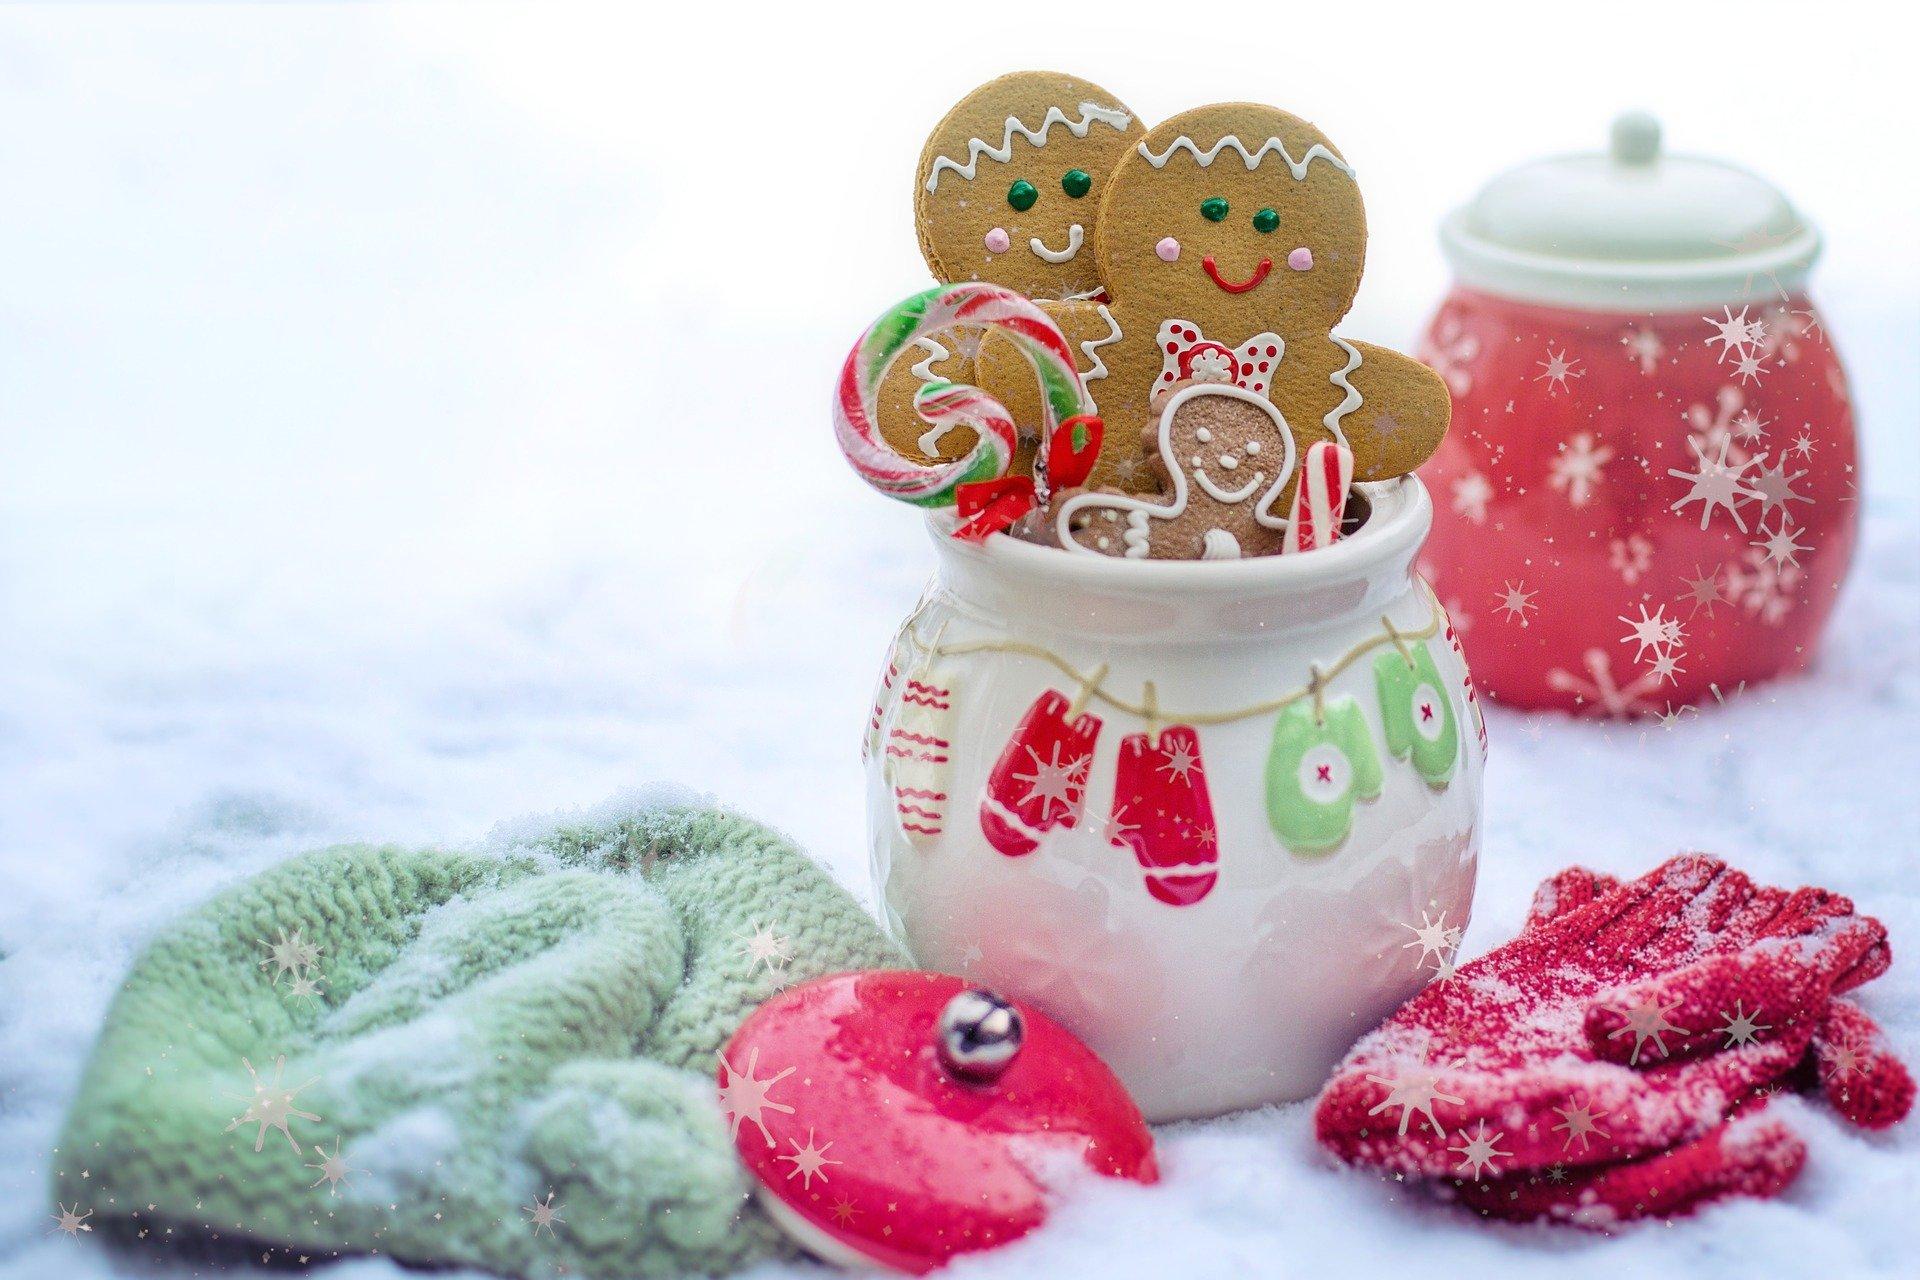 muñequitos de jengibre sobre decoración navideña